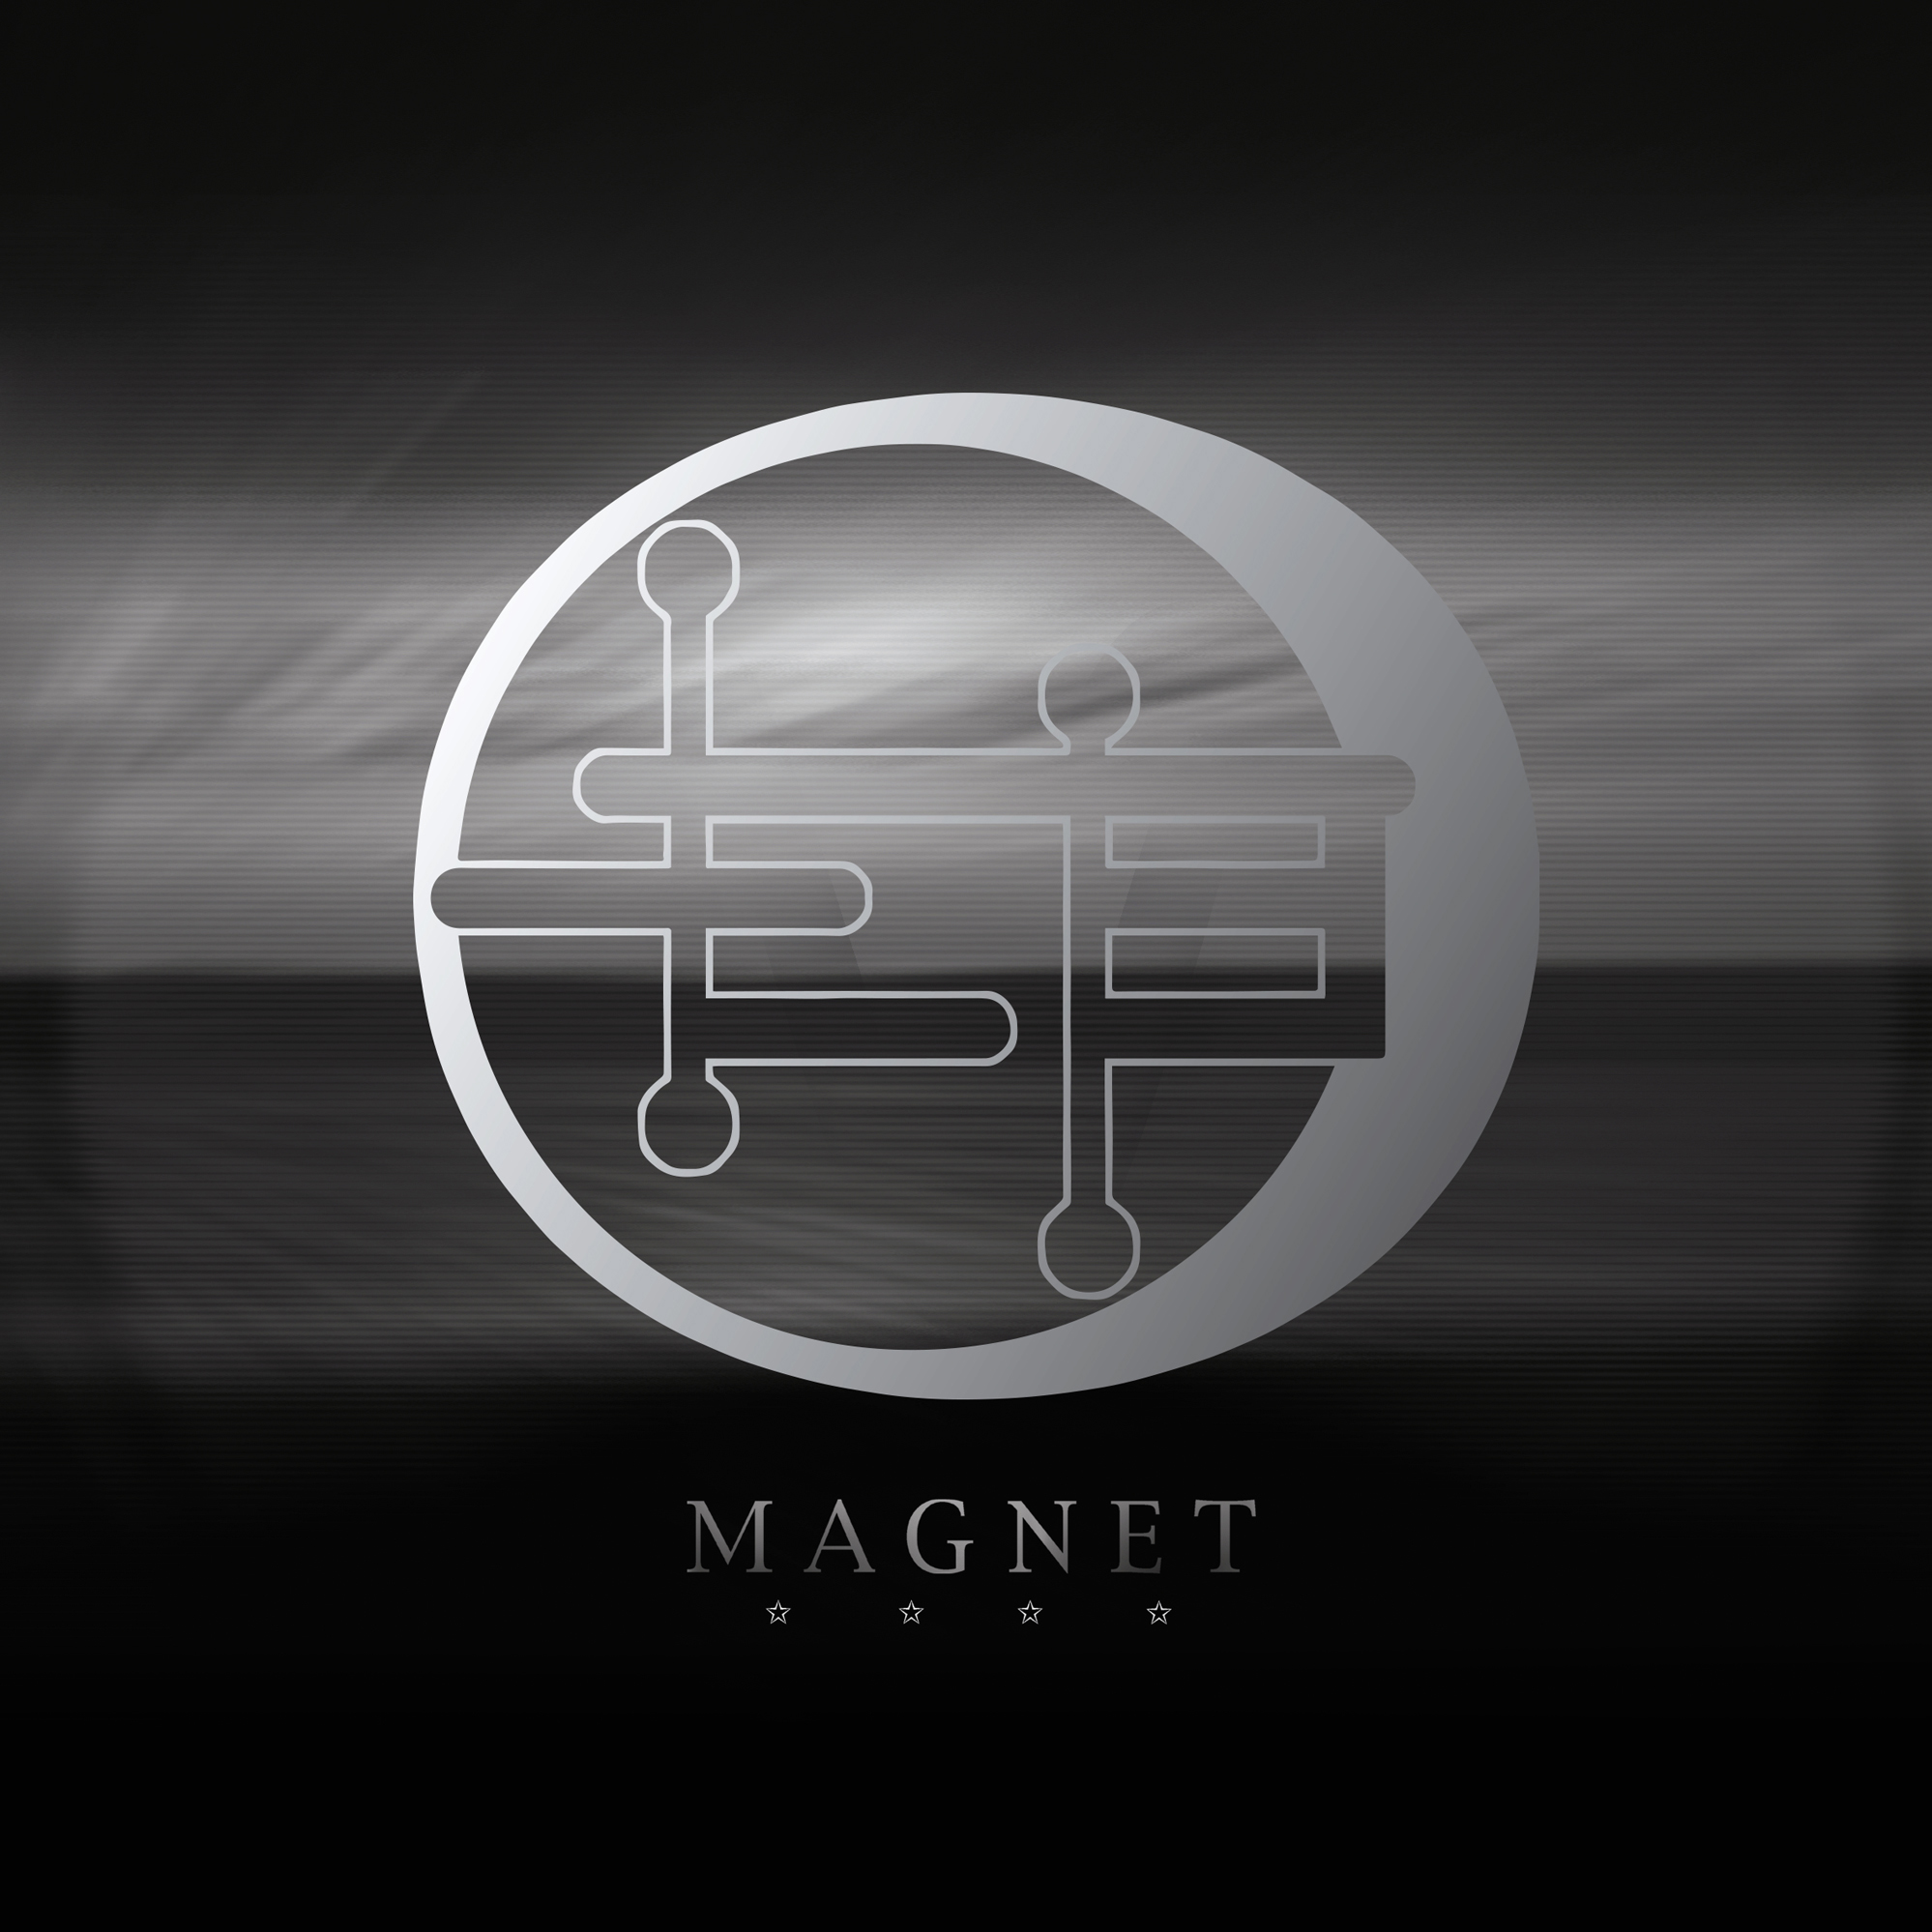 Eternal Basement - Magnet - BLUE ROOM RELEASED 1998